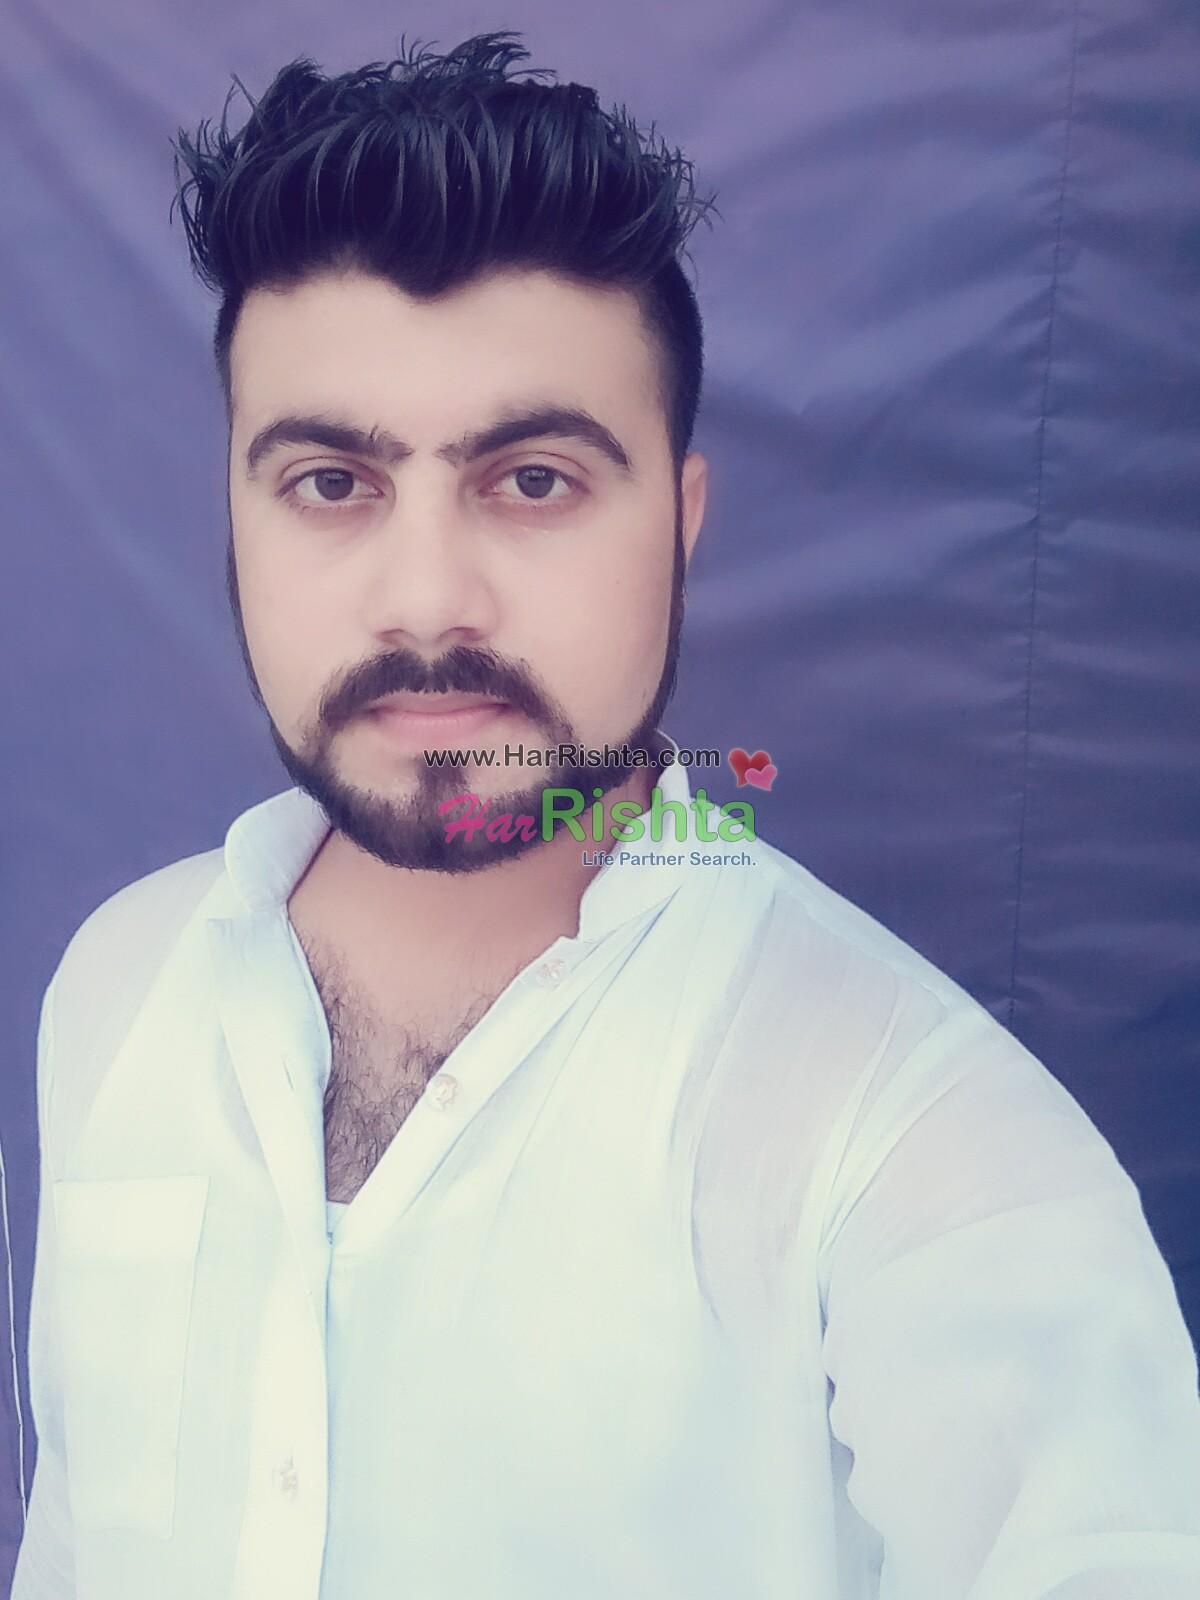 Other Boy Rishta in Gujrat